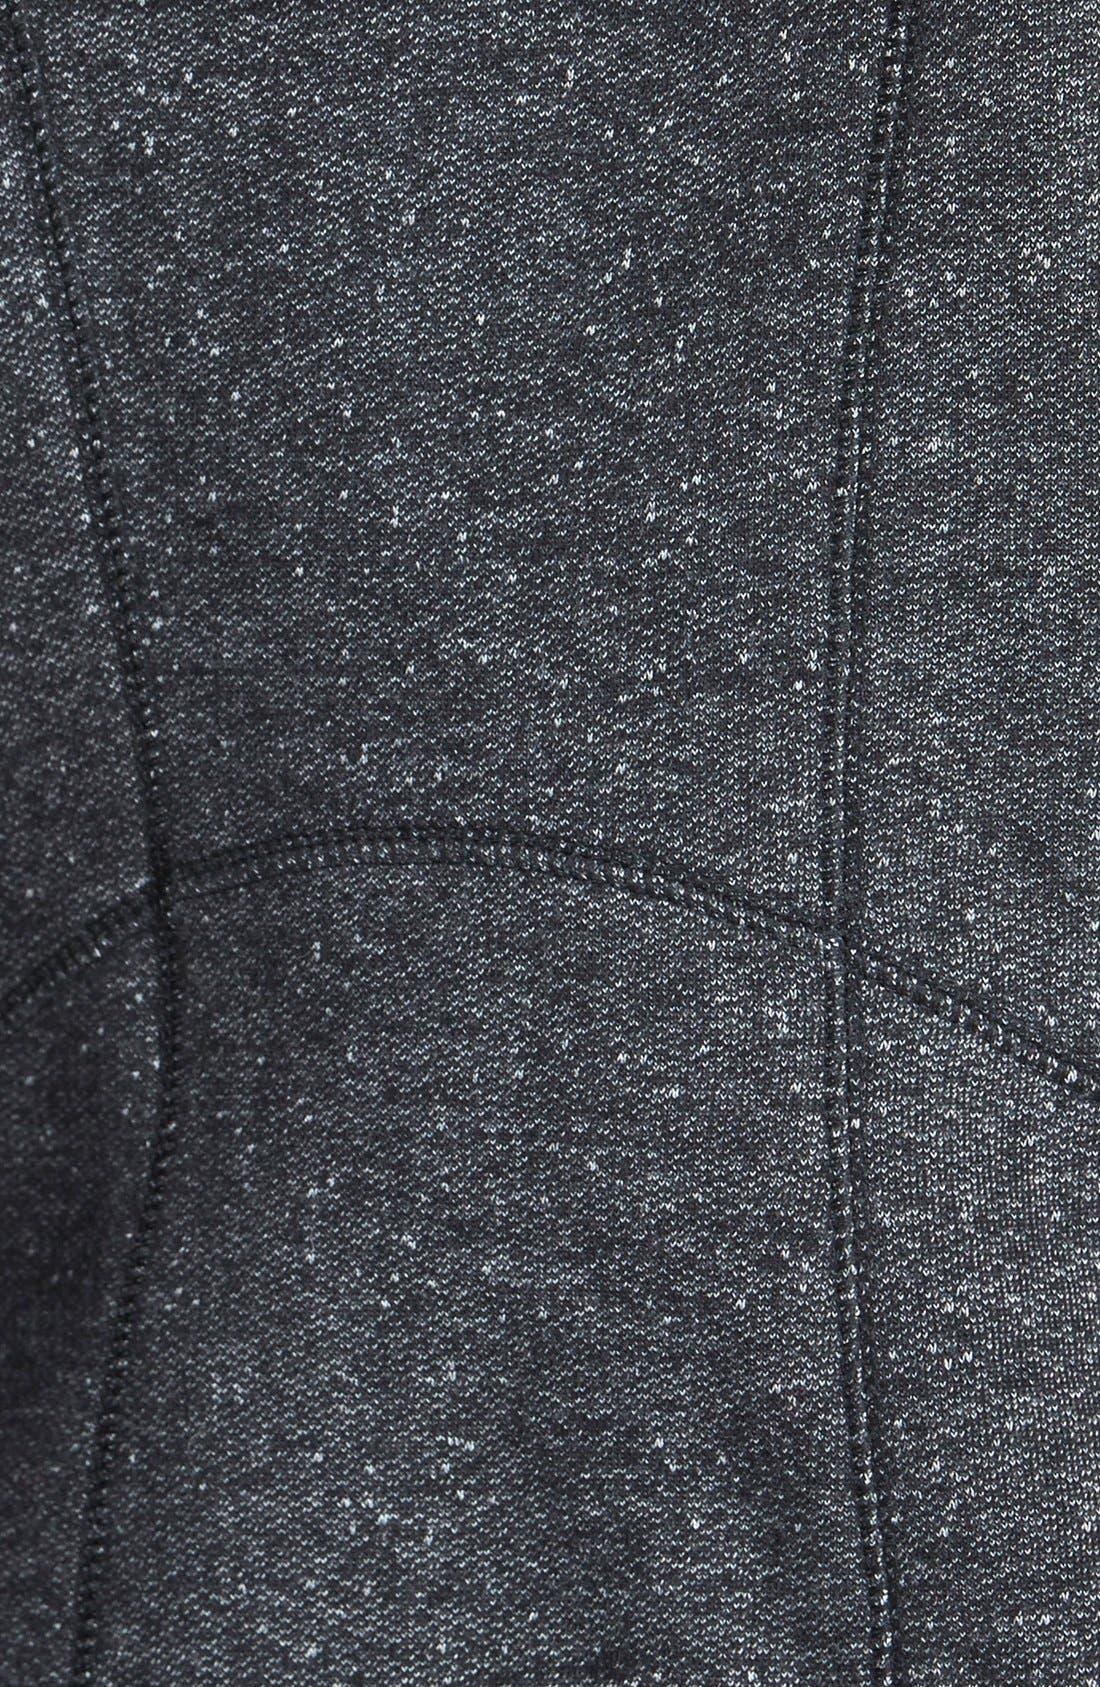 ZELLA, 'Pretty Moon Dust' Hooded Jacket, Alternate thumbnail 2, color, 002